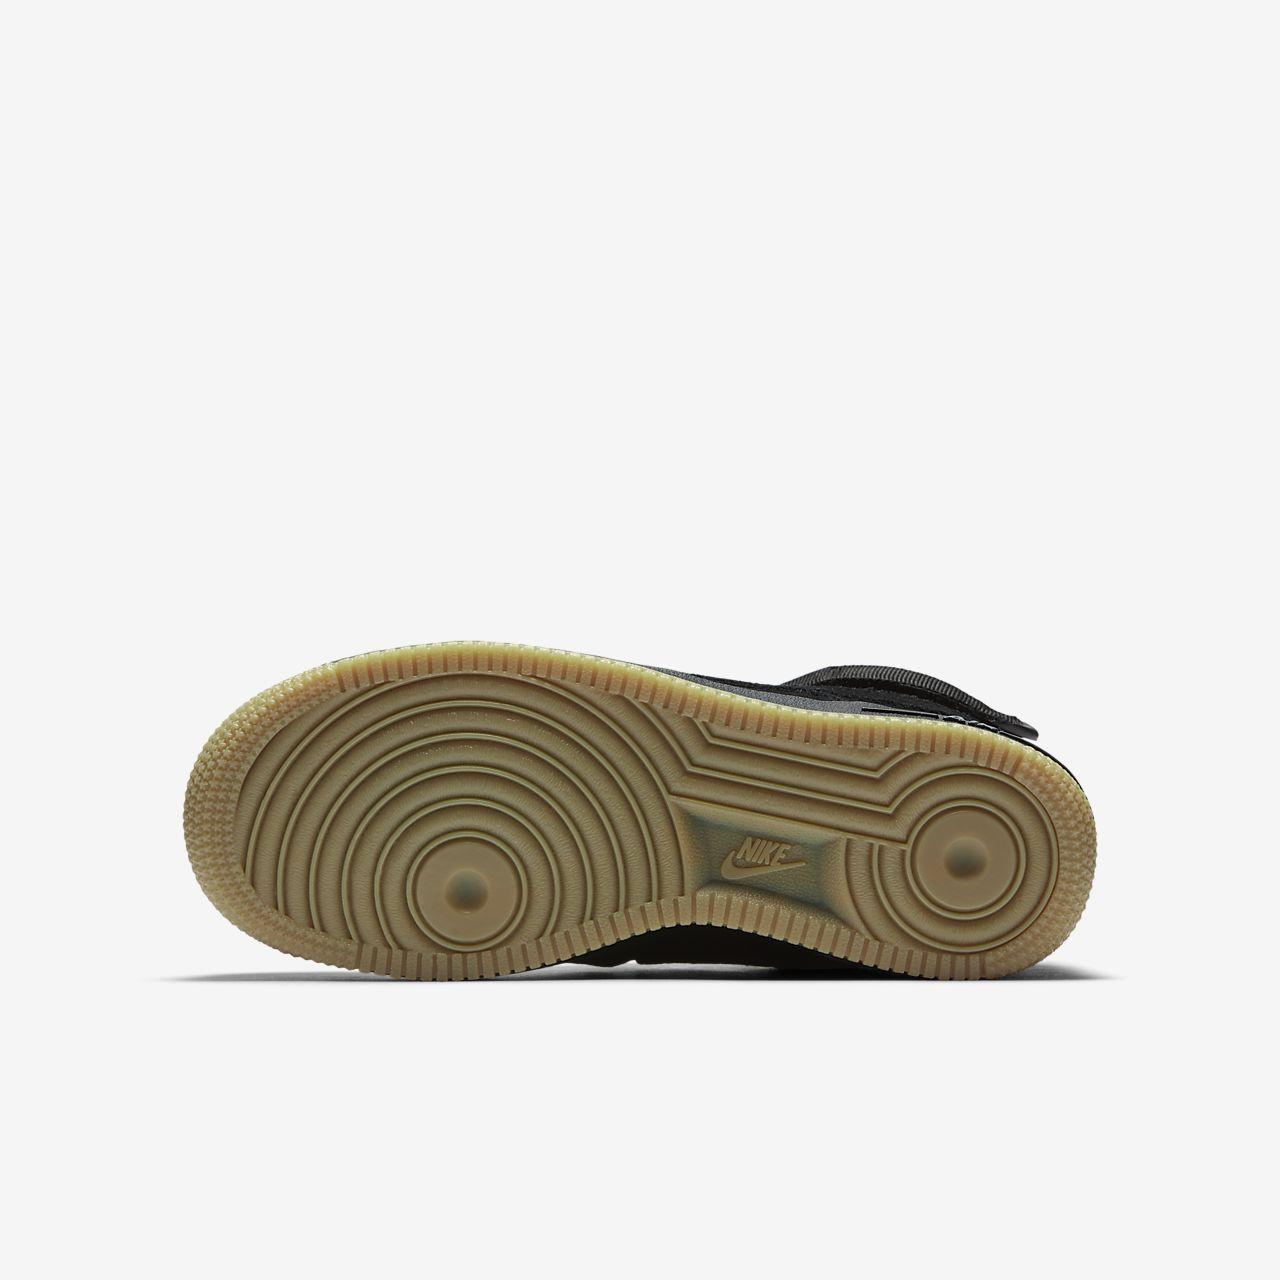 the latest b0fff f45f8 ... Nike Air Force 1 High LV8 Big Kids  Shoe